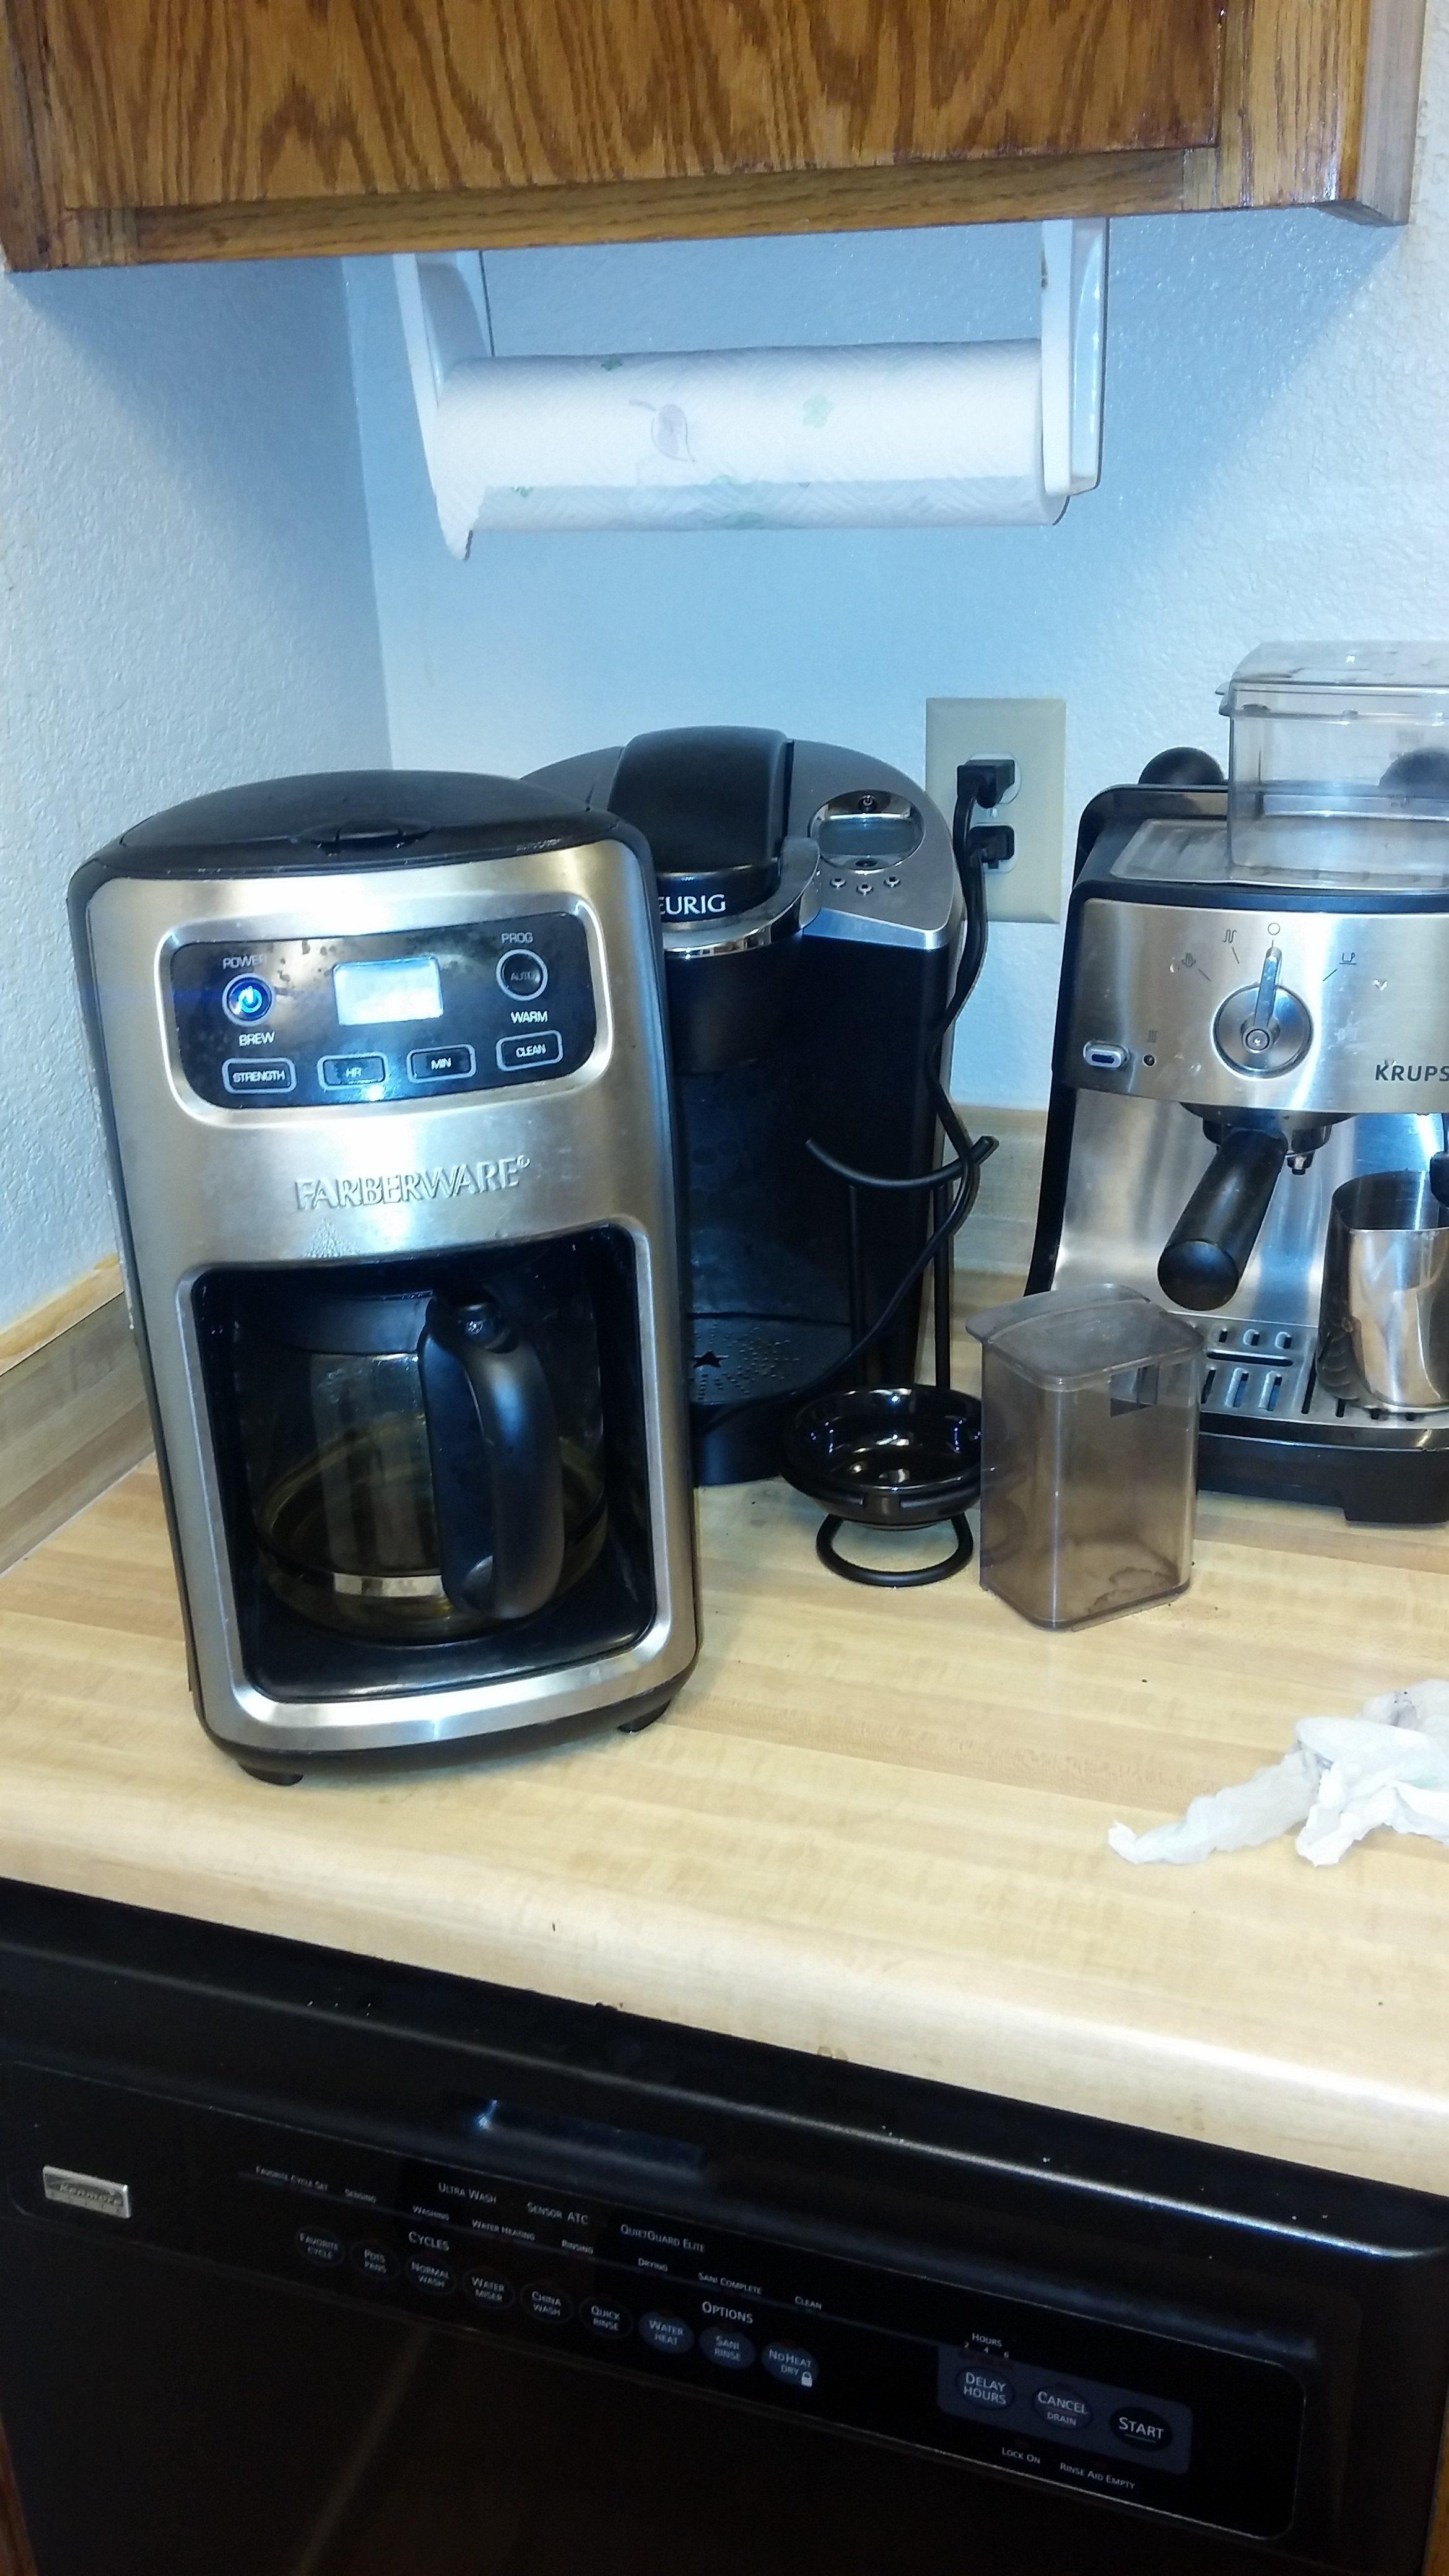 Farberware Coffee Maker Ratings : Top 119 Complaints and Reviews about Farberware Coffee Makers